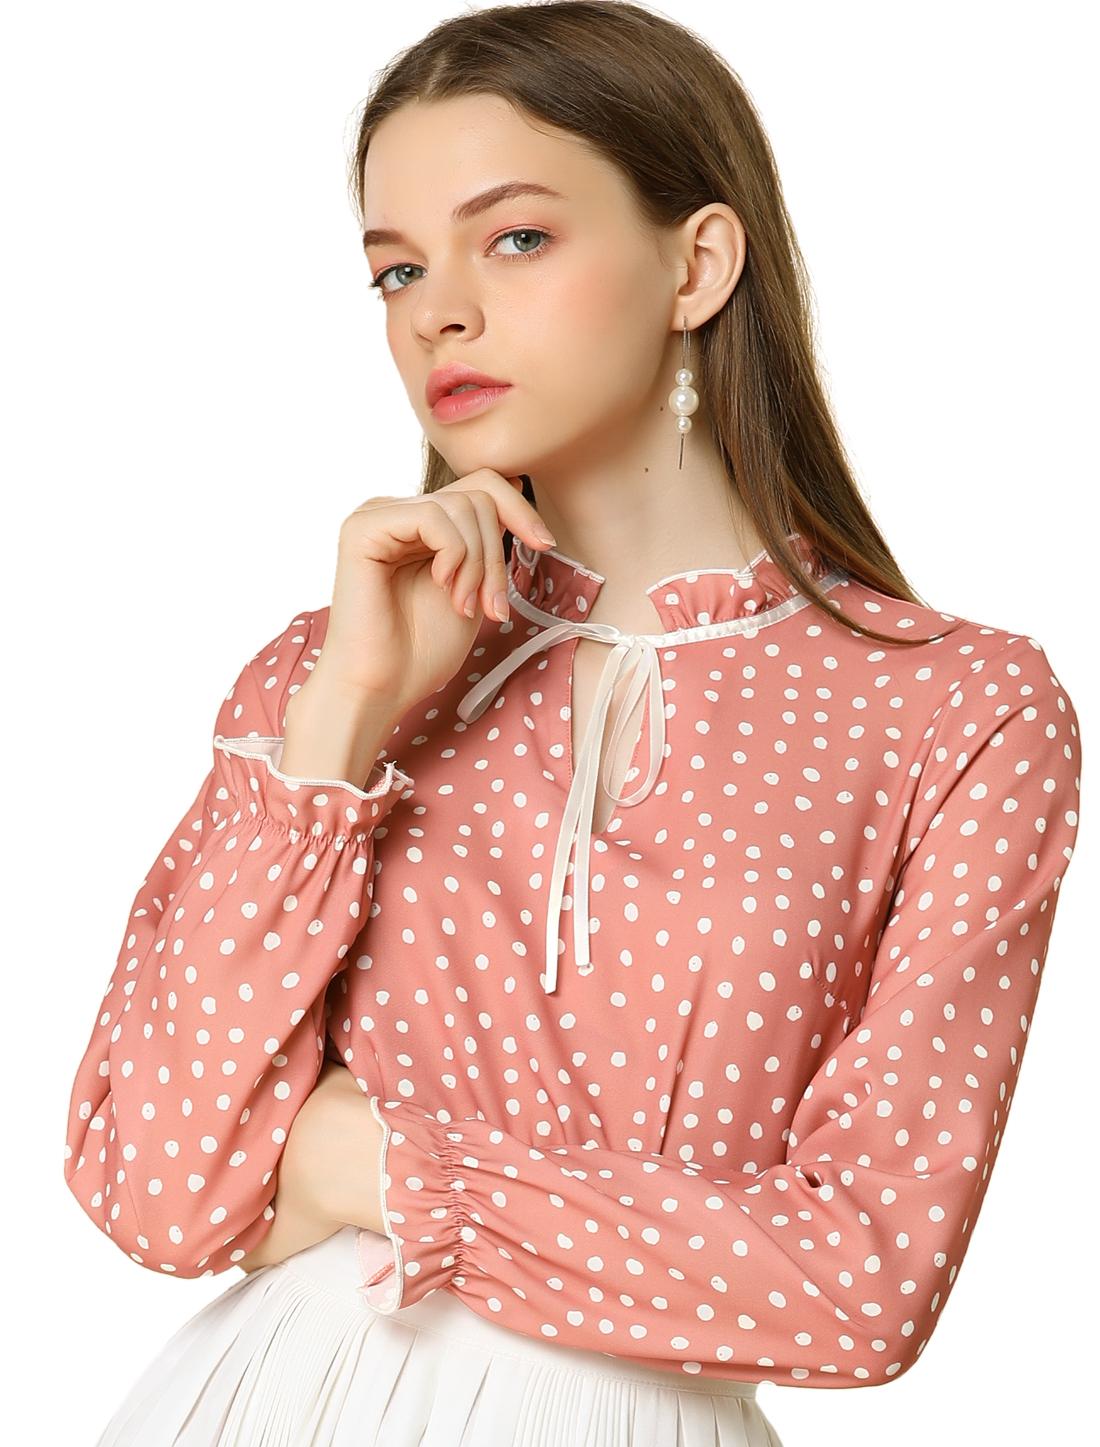 Allegra K Women's Tie Ruffled Neck Polka Dots Blouse Bell Sleeves Tops Pink S